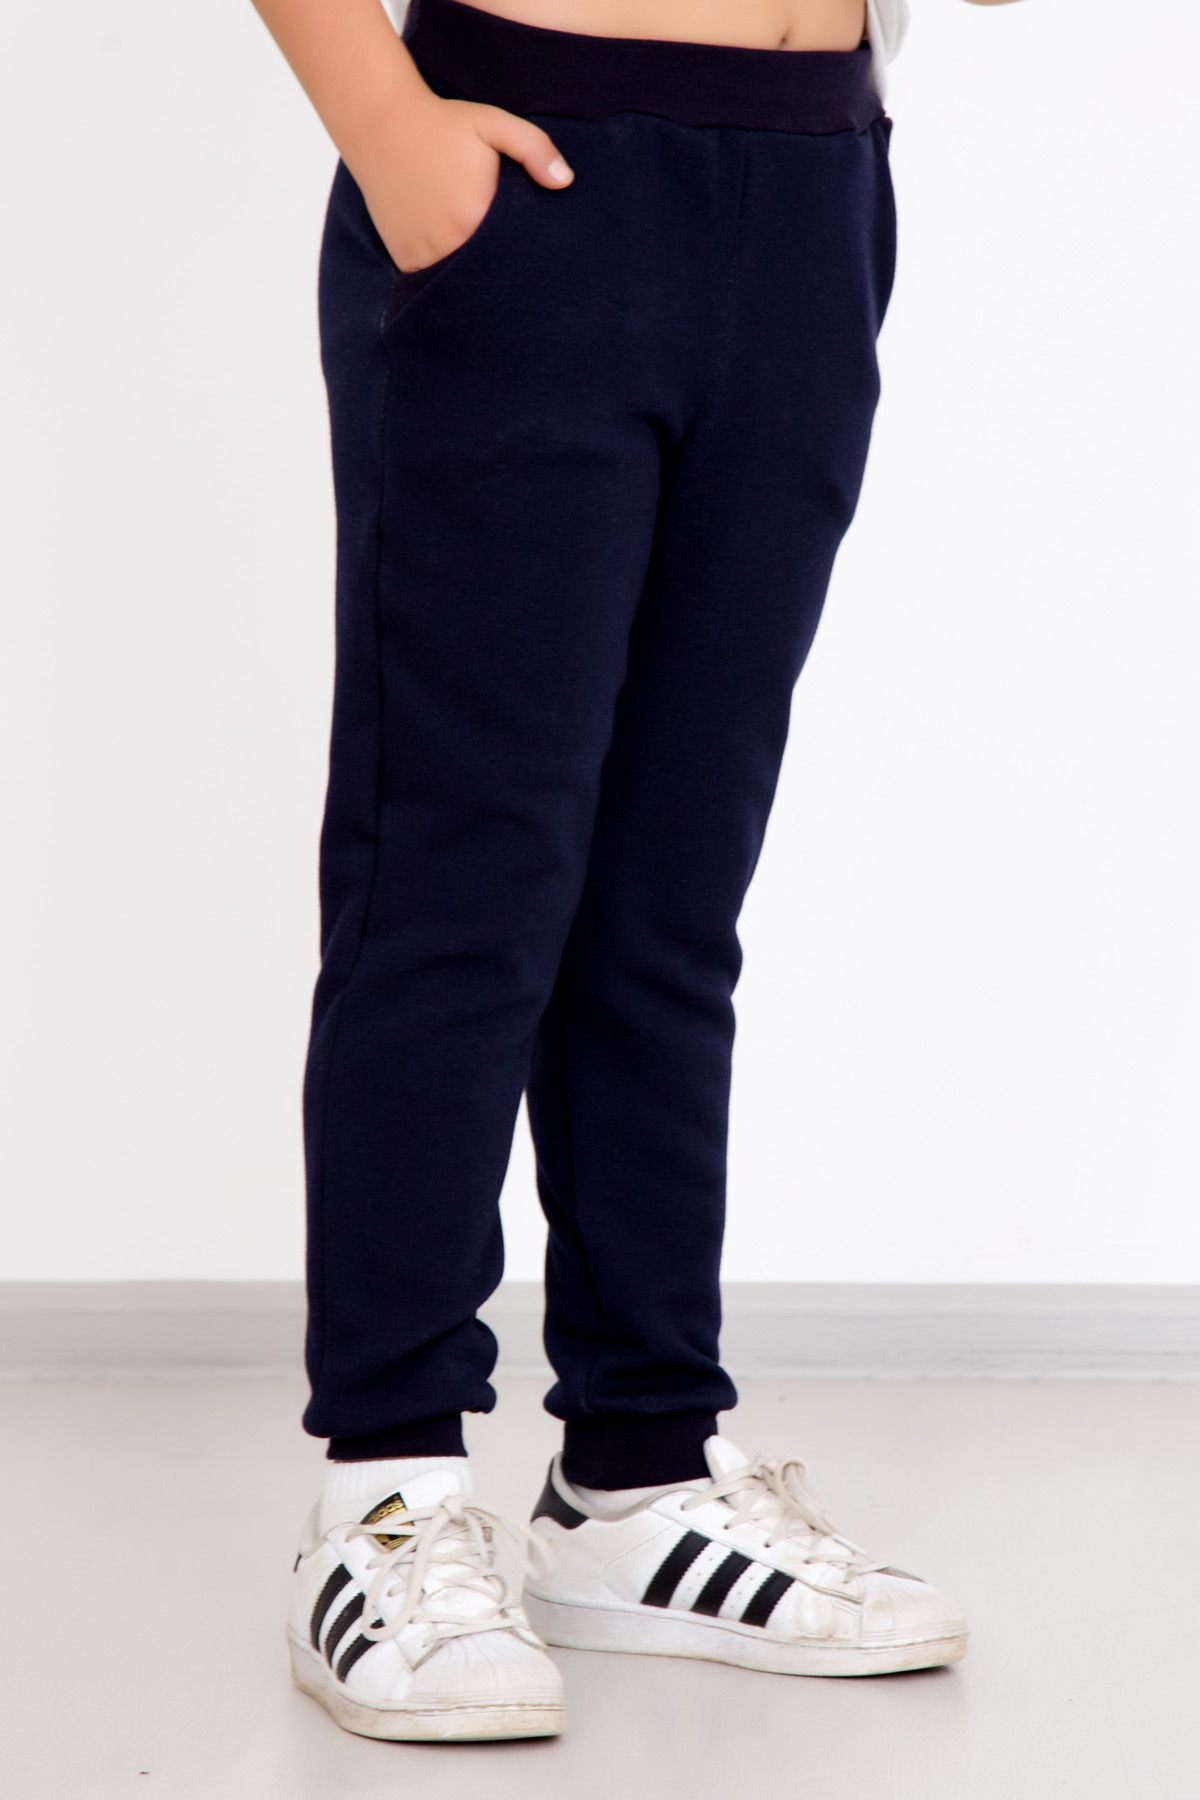 Дет. брюки Спринт р. 30Шорты, бриджи, брюки<br><br><br>Тип: Дет. брюки<br>Размер: 30<br>Материал: Интерсофт